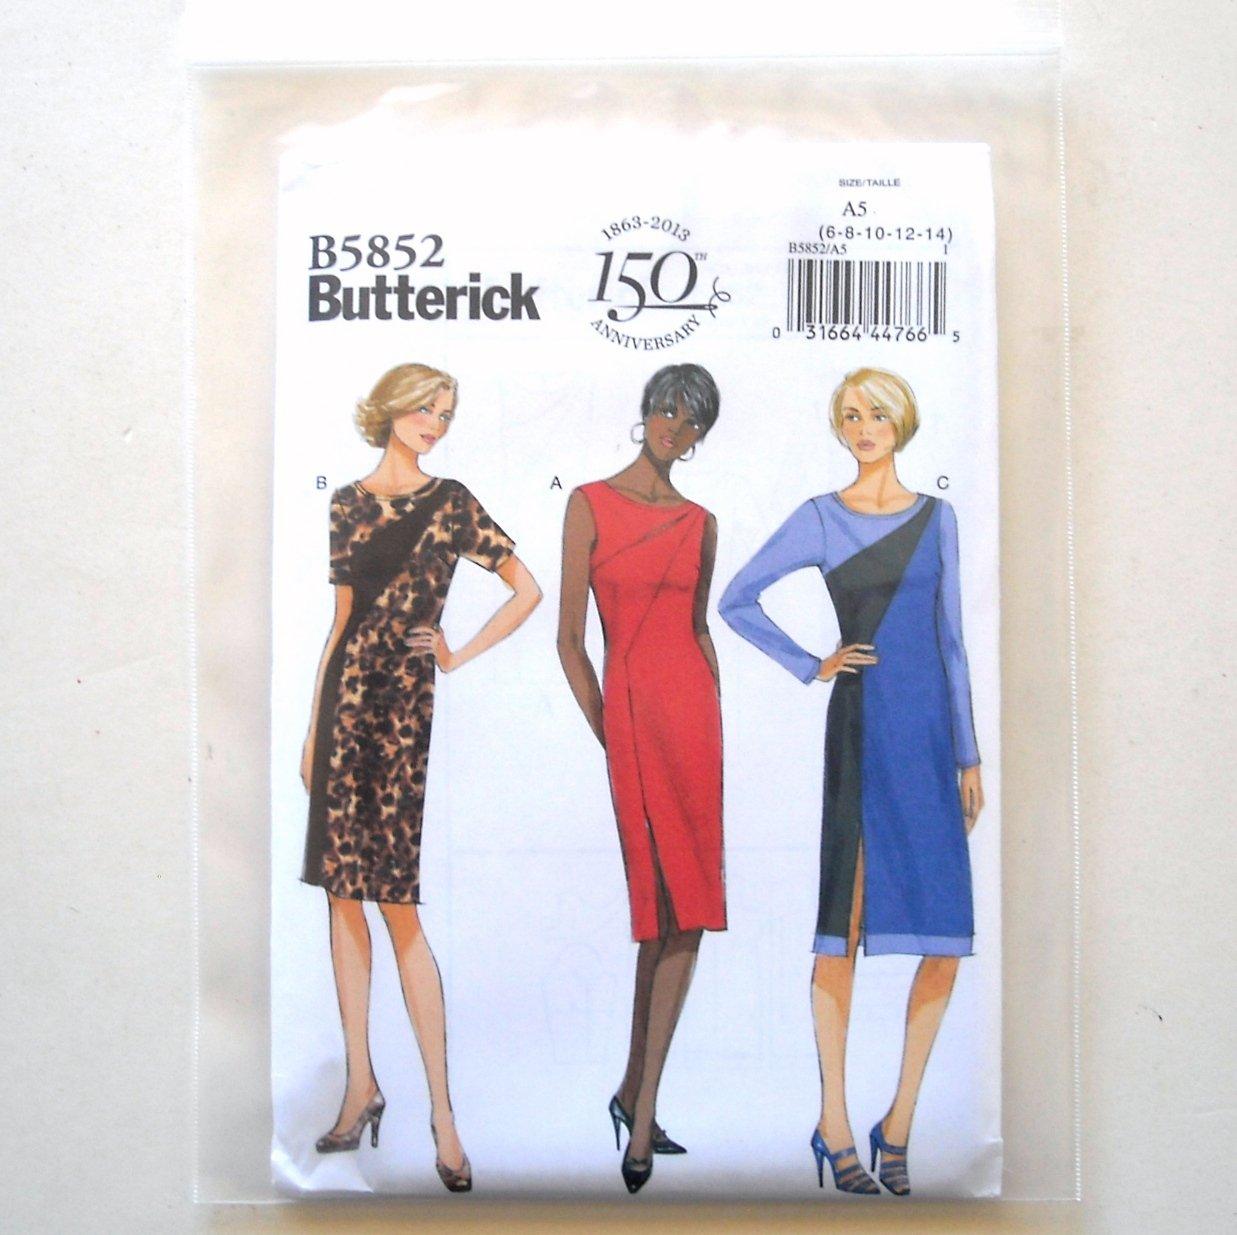 Misses' Misses' Petite Dress Size 6 - 14 Butterick Pattern B5852